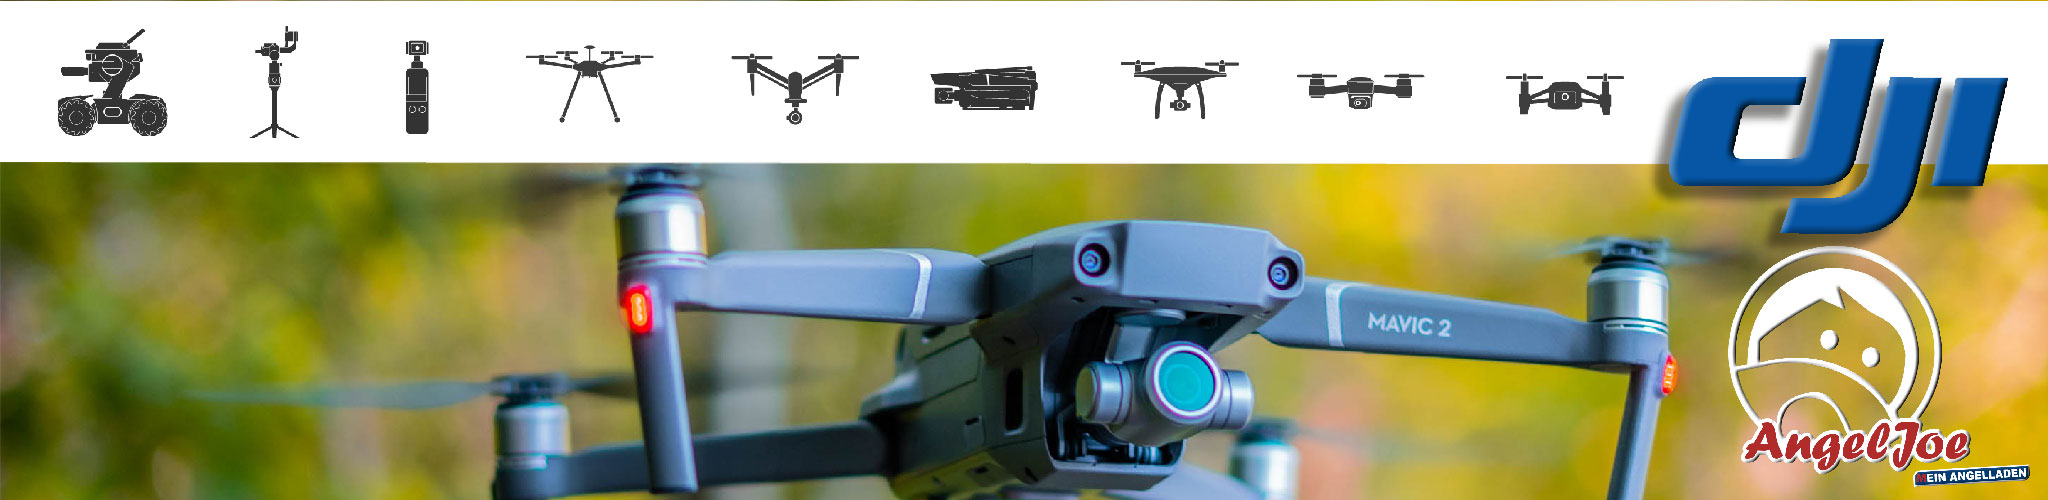 AngelJoe DJI Drohne Osmo Gimbal